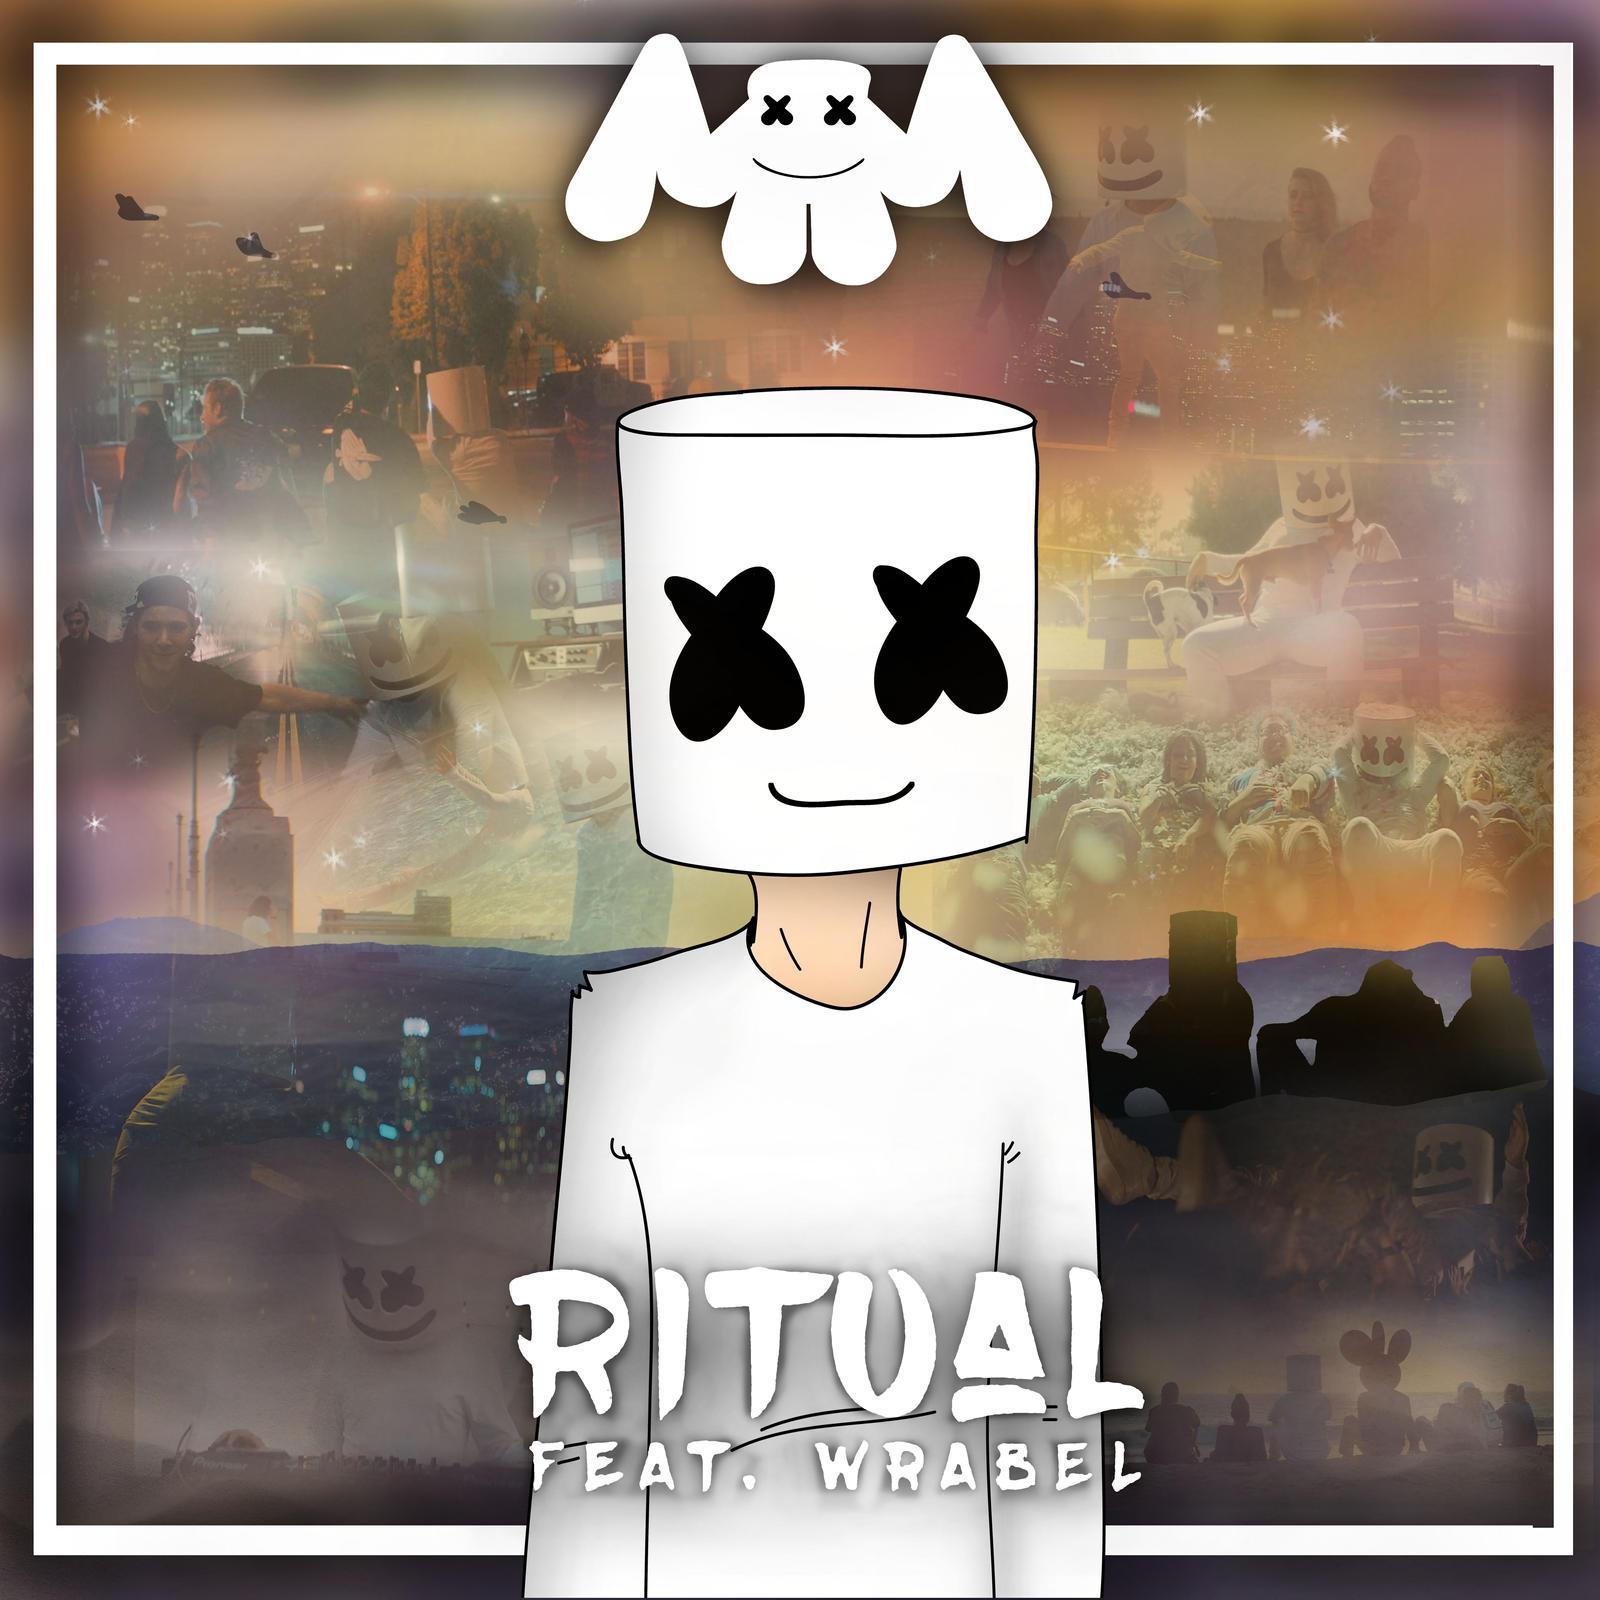 Marshmello feat. Wrabel - Ritual (1) by joshuacarlbaradas